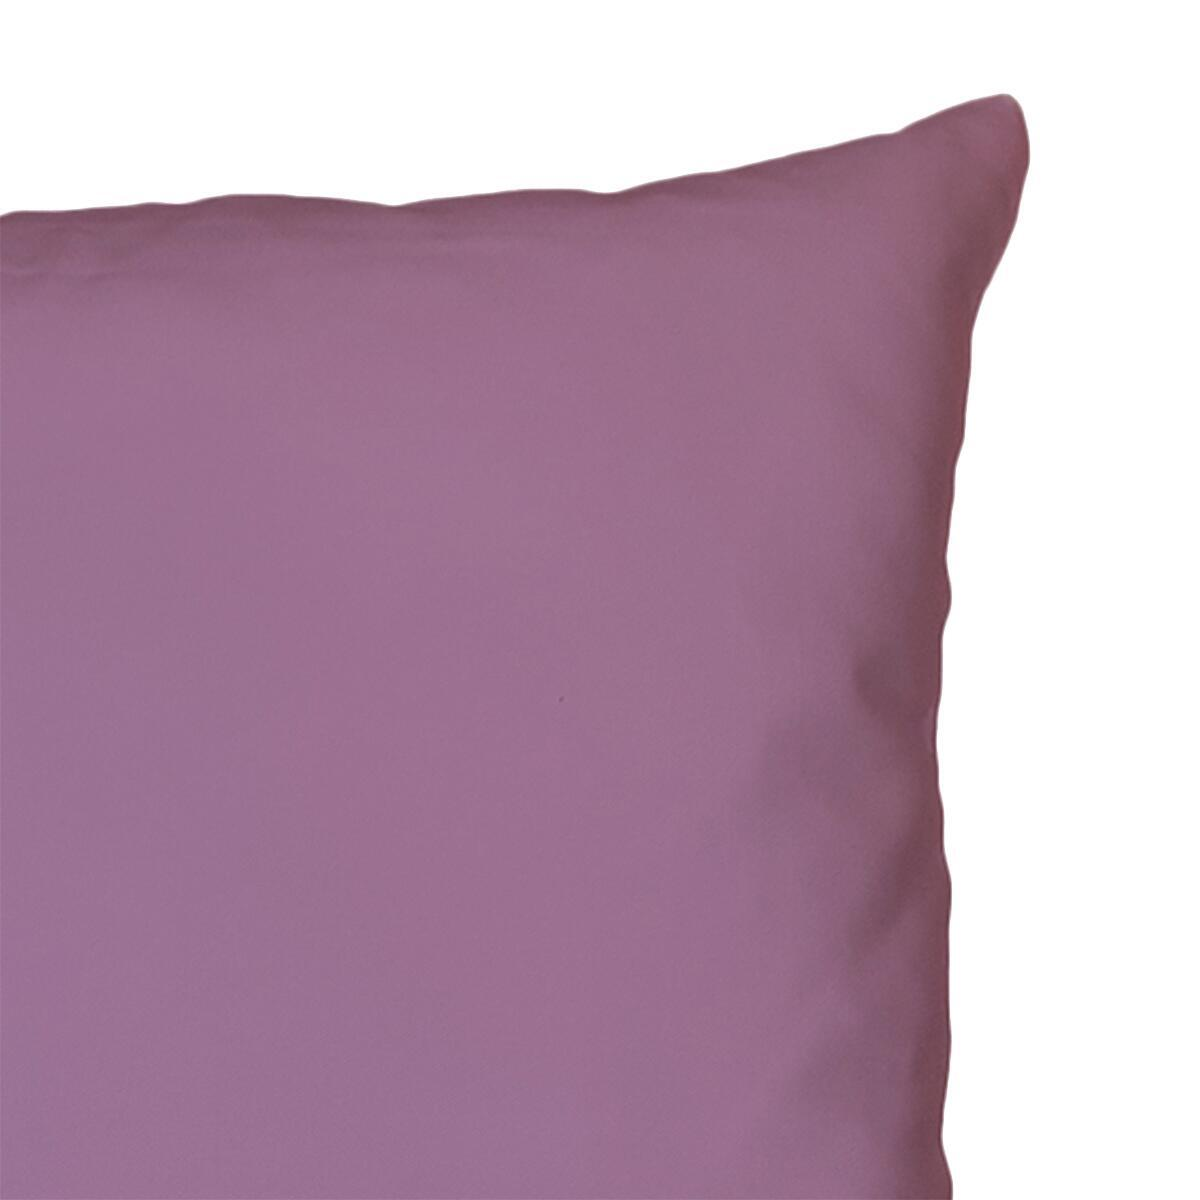 Cuscino Loneta lilla 60x60 cm - 3